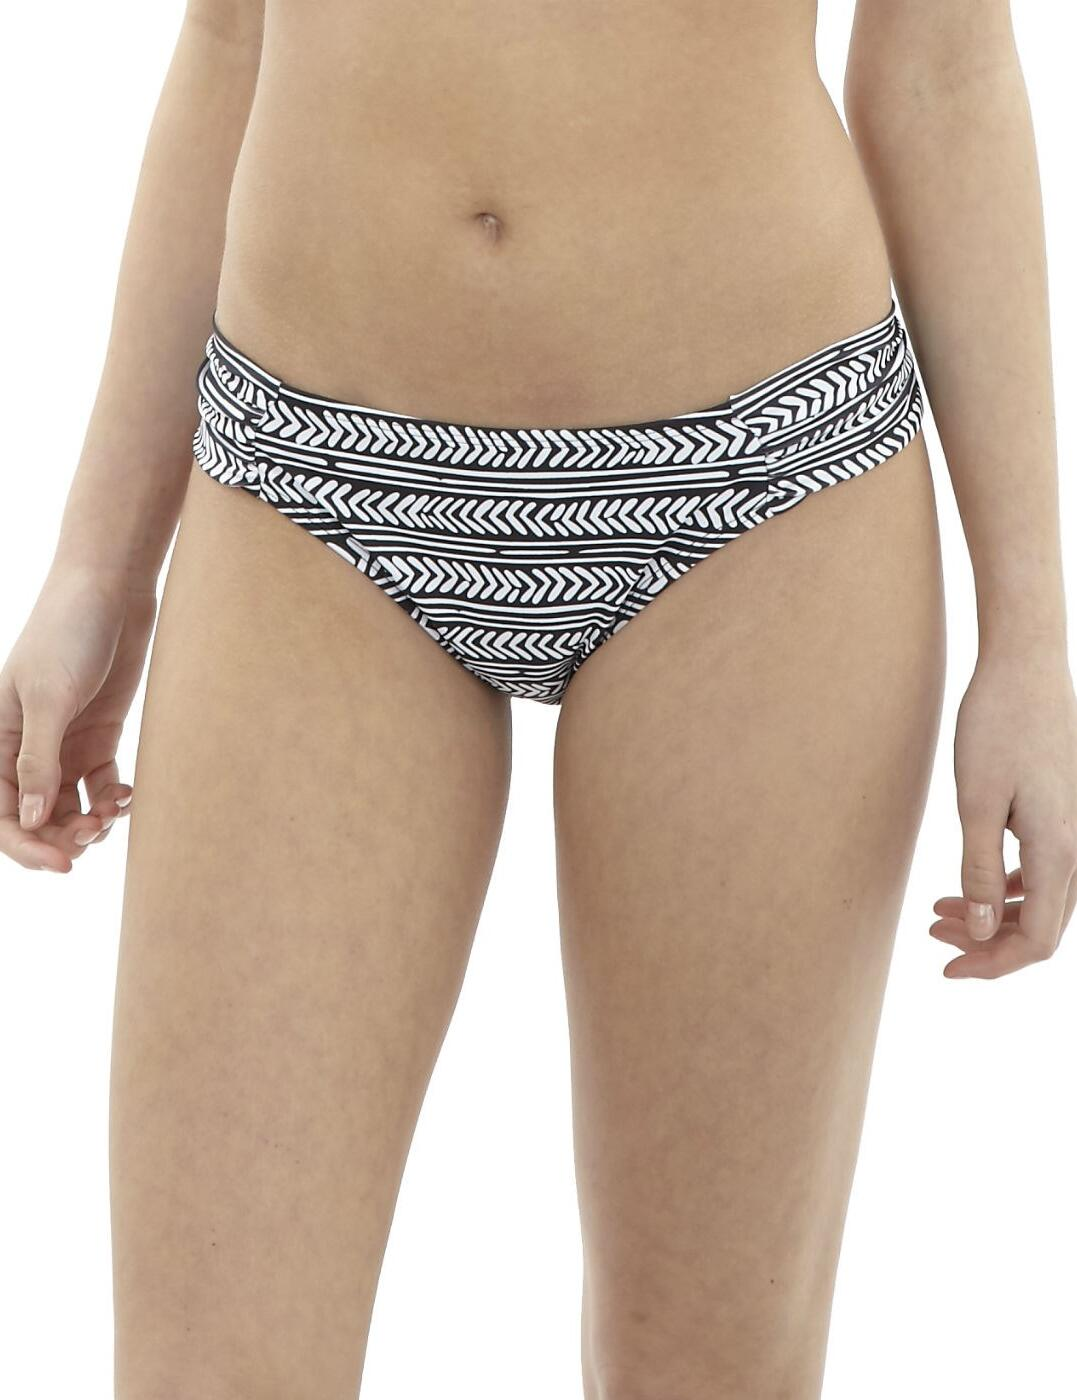 CW0266 Cleo Hattie Ruch Bikini Brief - CW0266 Black/White